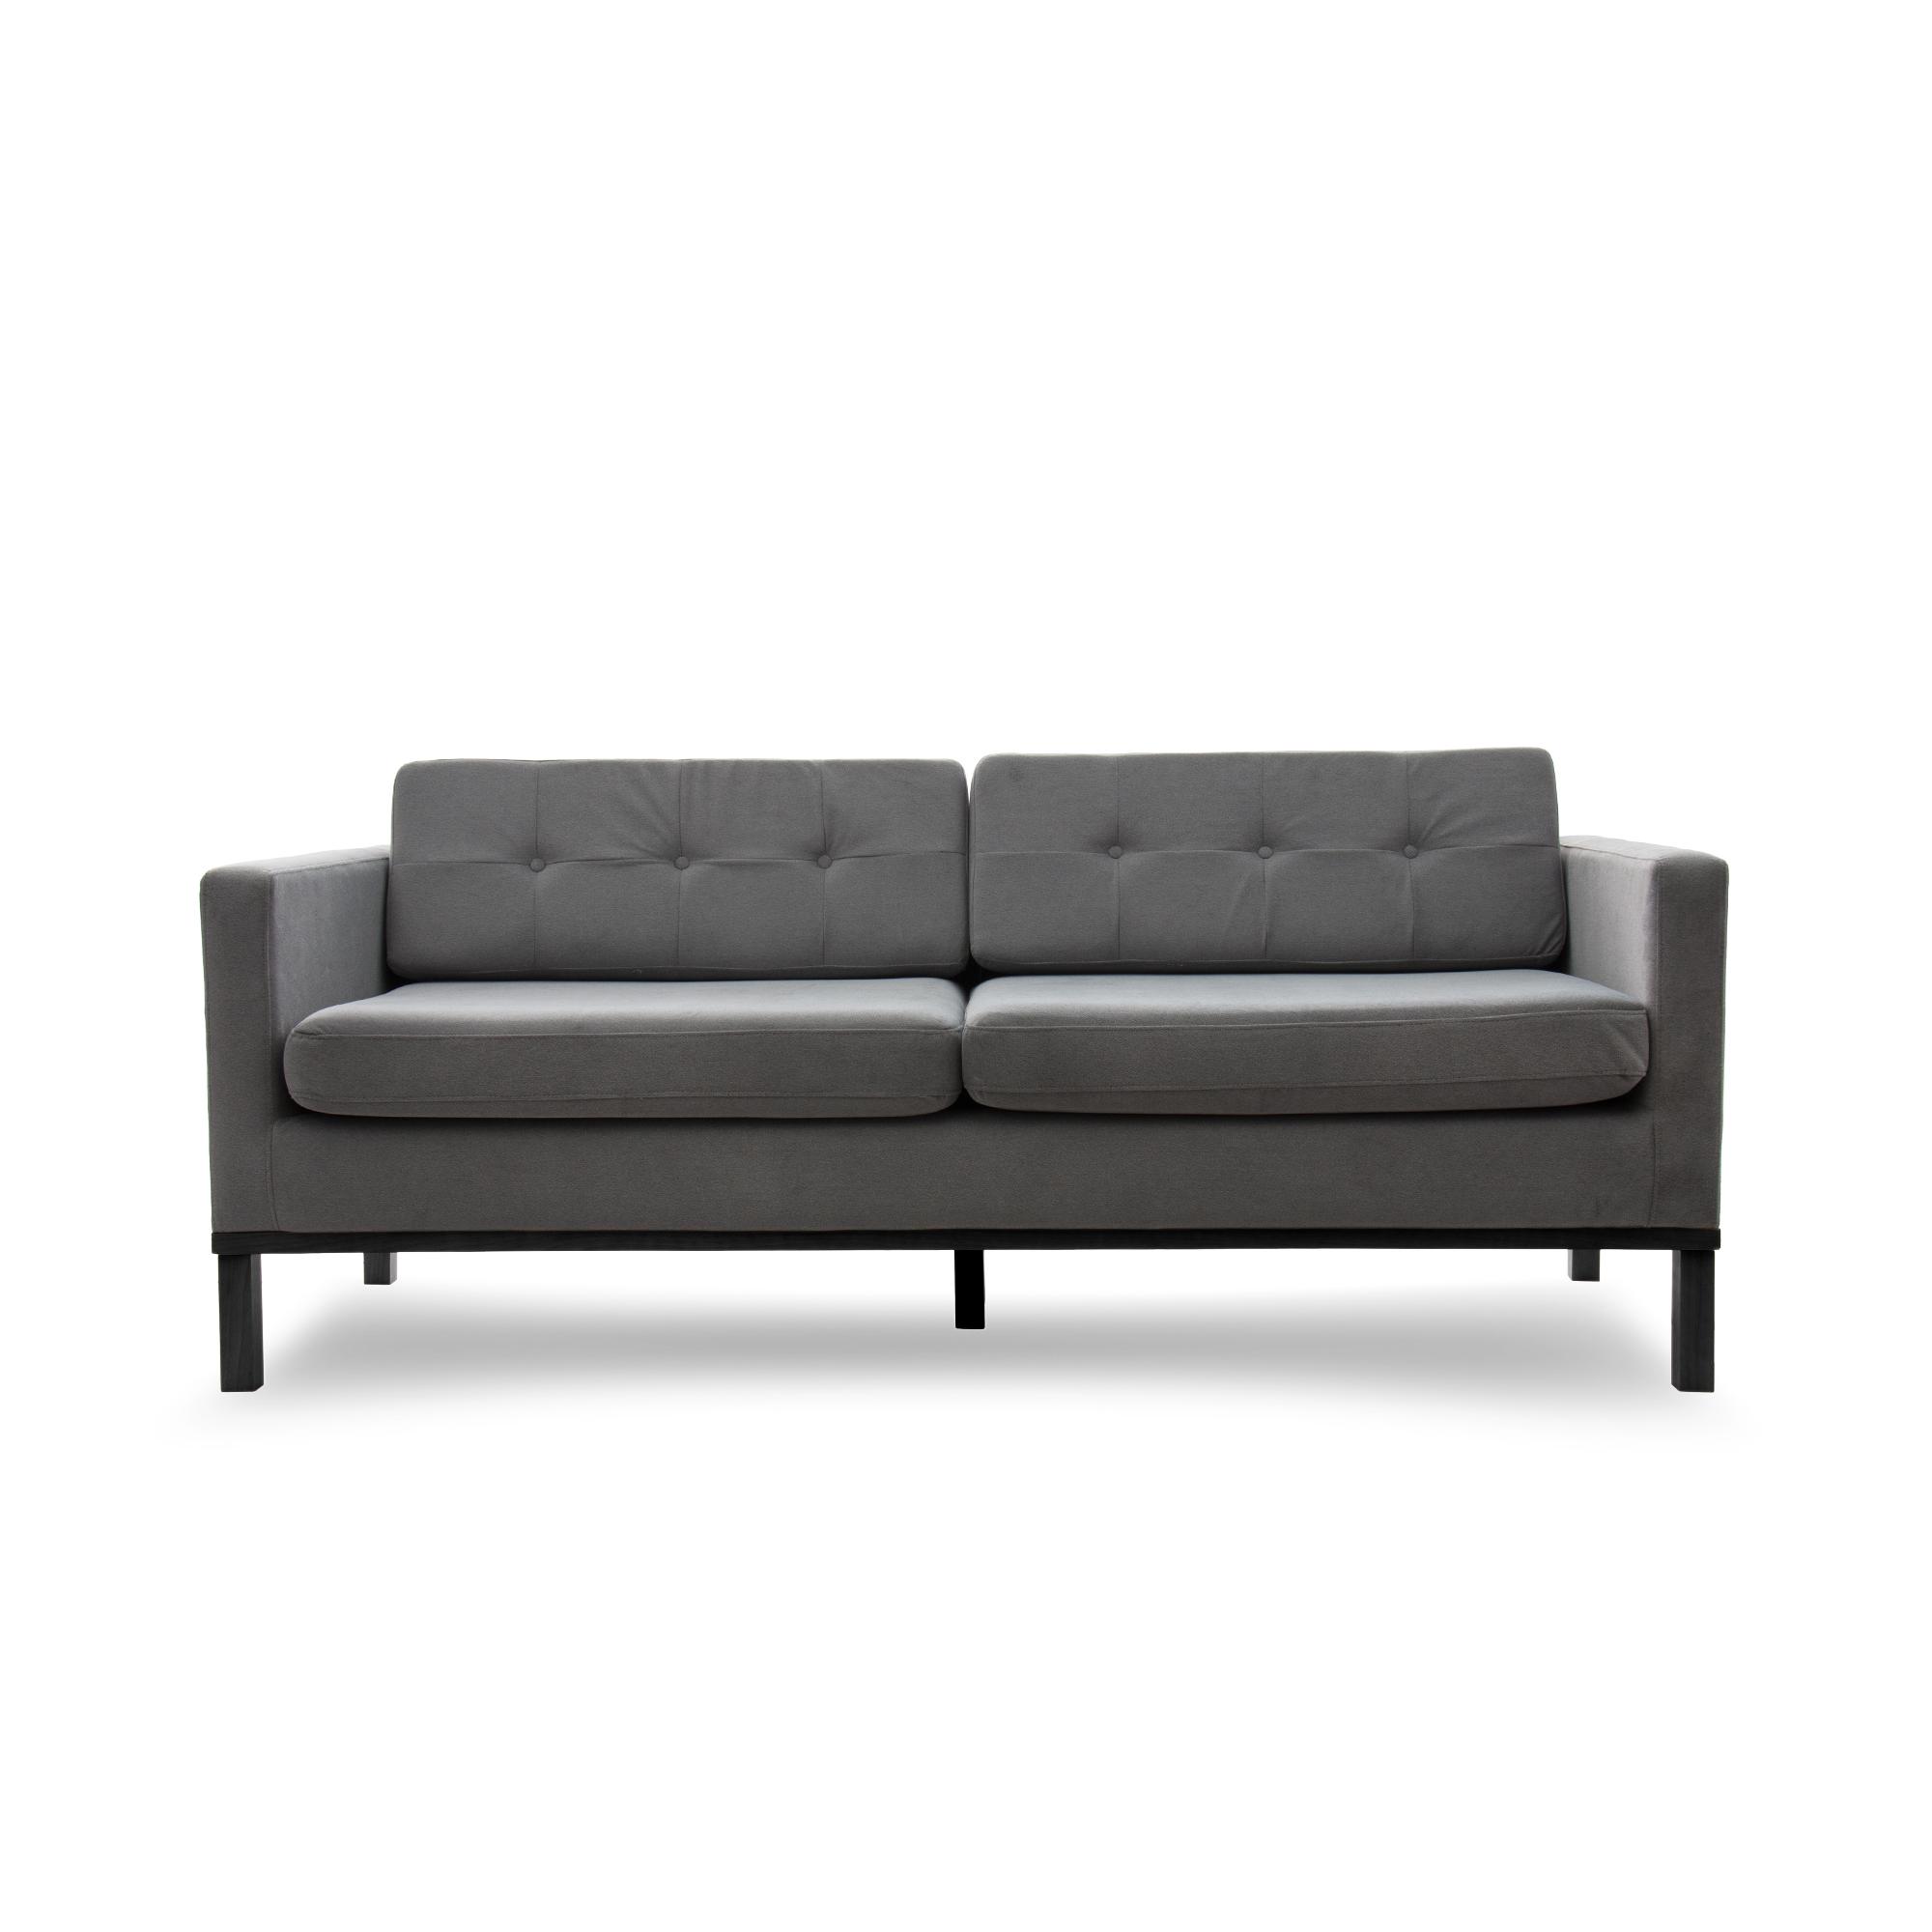 Canapea Fixa 3 locuri Jonan Light Grey/Black